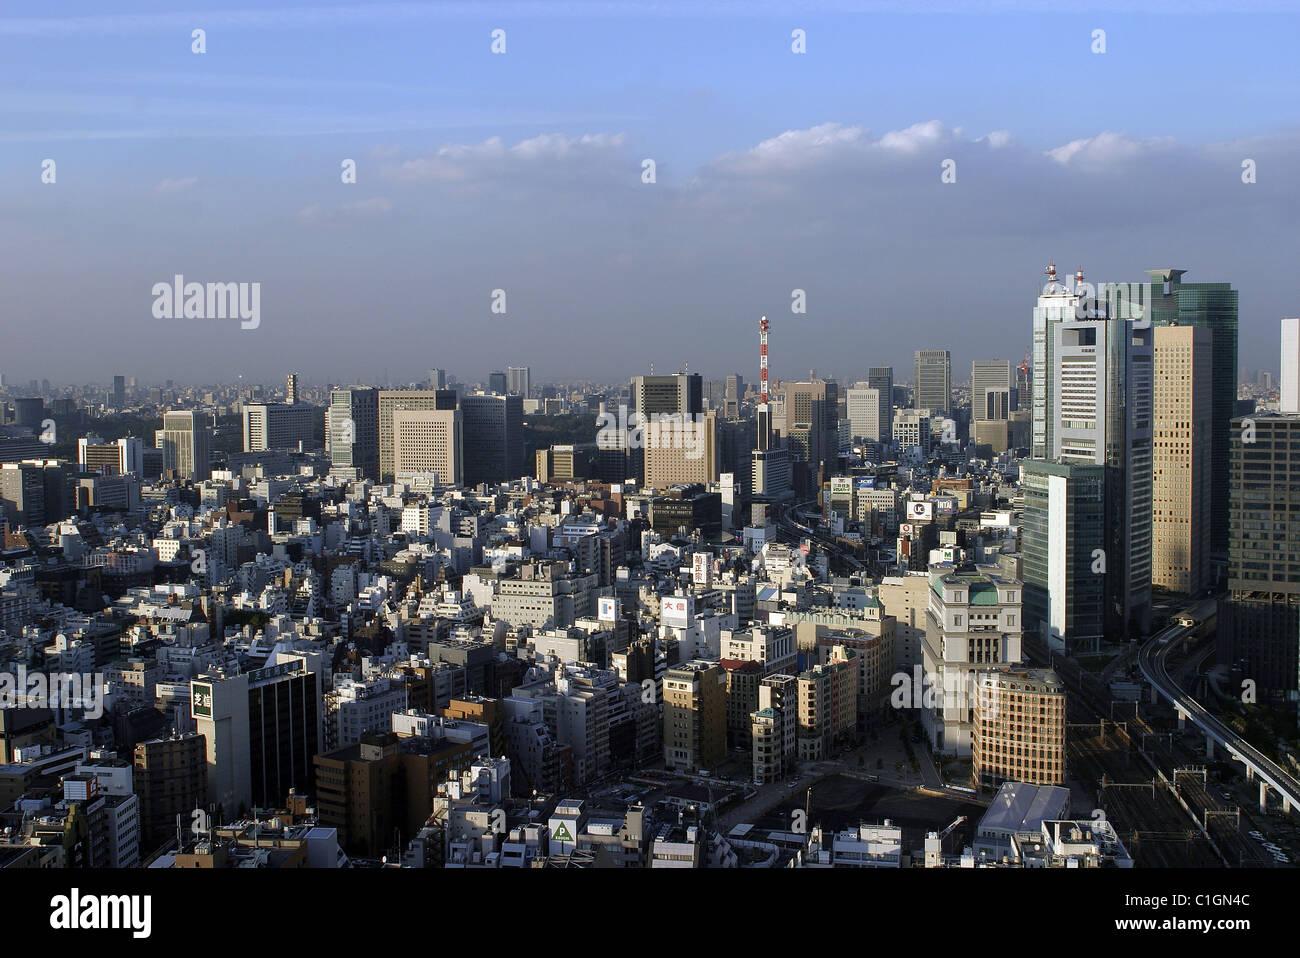 Japon, Honshu Island, Tokyo city - Stock Image